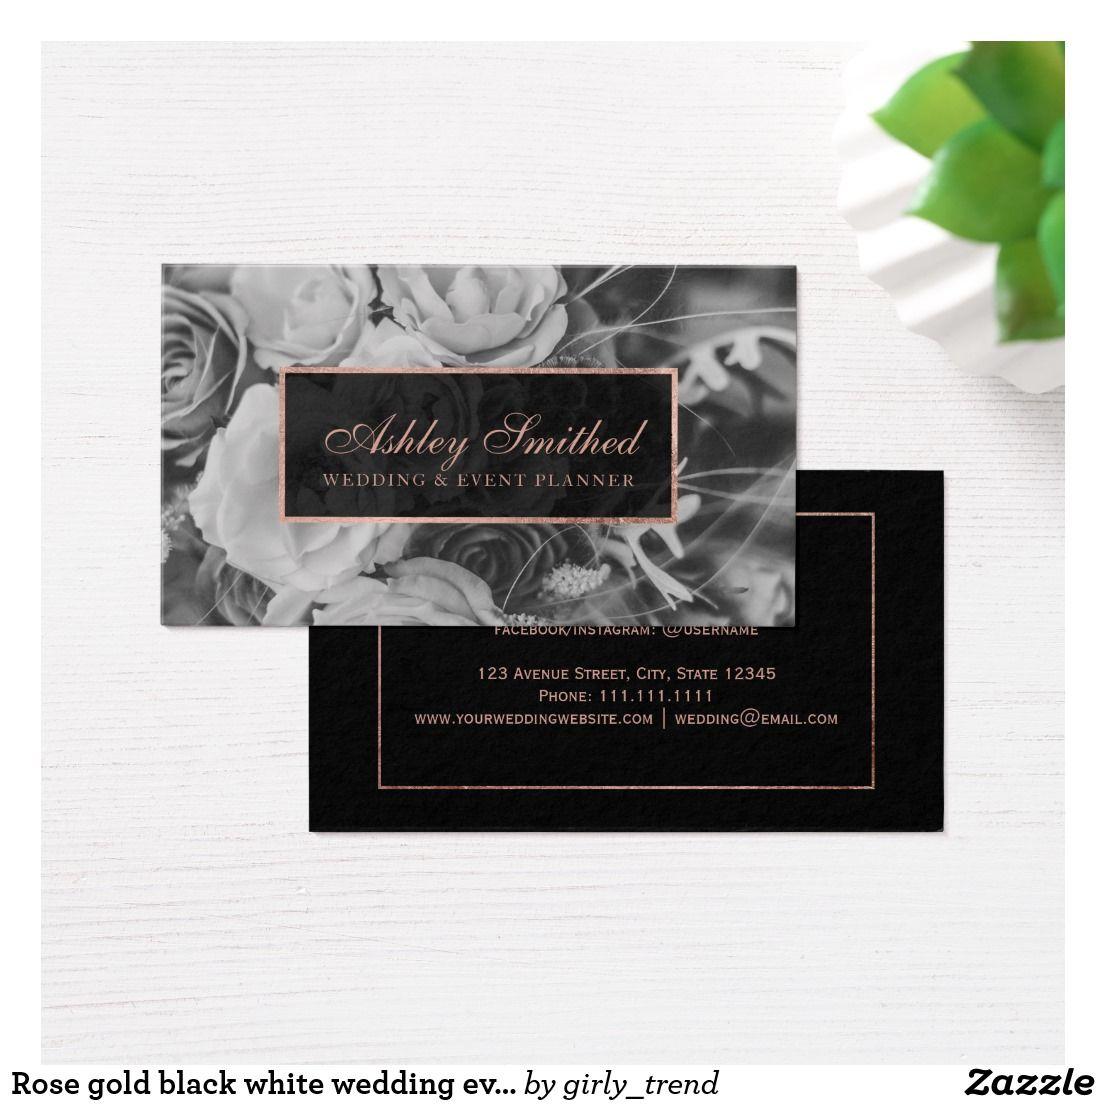 Rose Gold Black White Wedding Event Planner Photo Business Card Zazzle Com Wedding Planner Business Card Wedding Event Planner Photo Business Cards